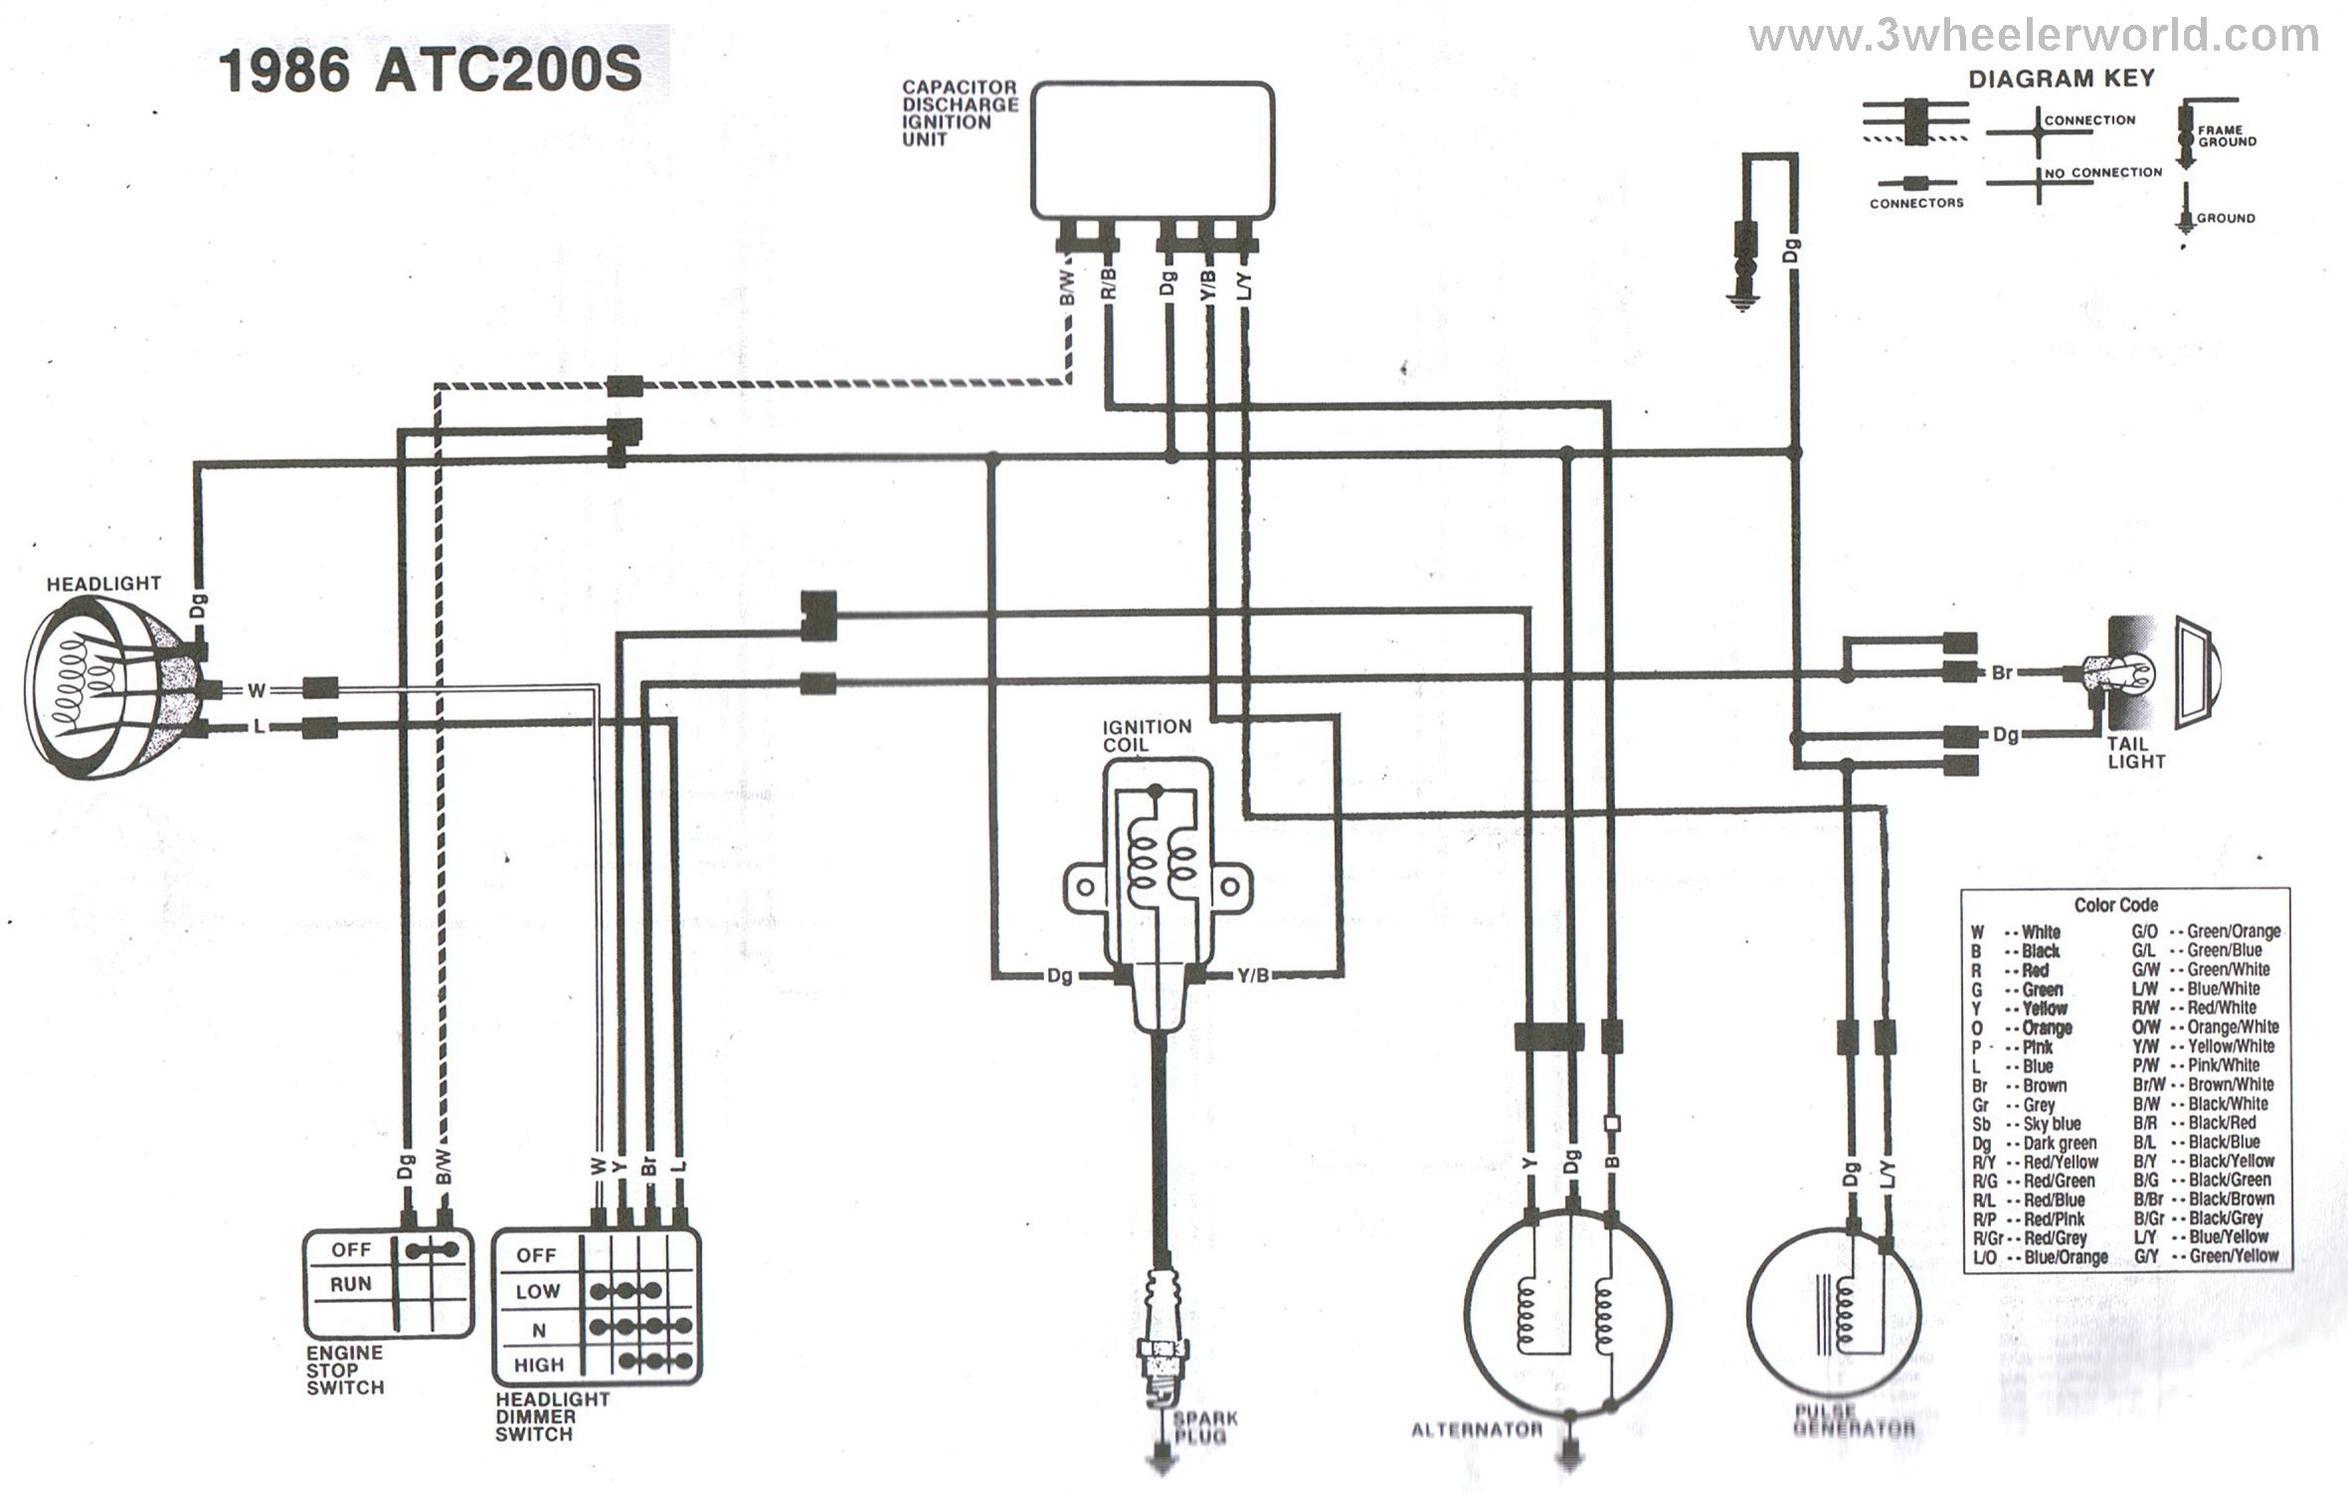 Viper 211hv Wiring Diagram ScyTek Car Wiring Diagram